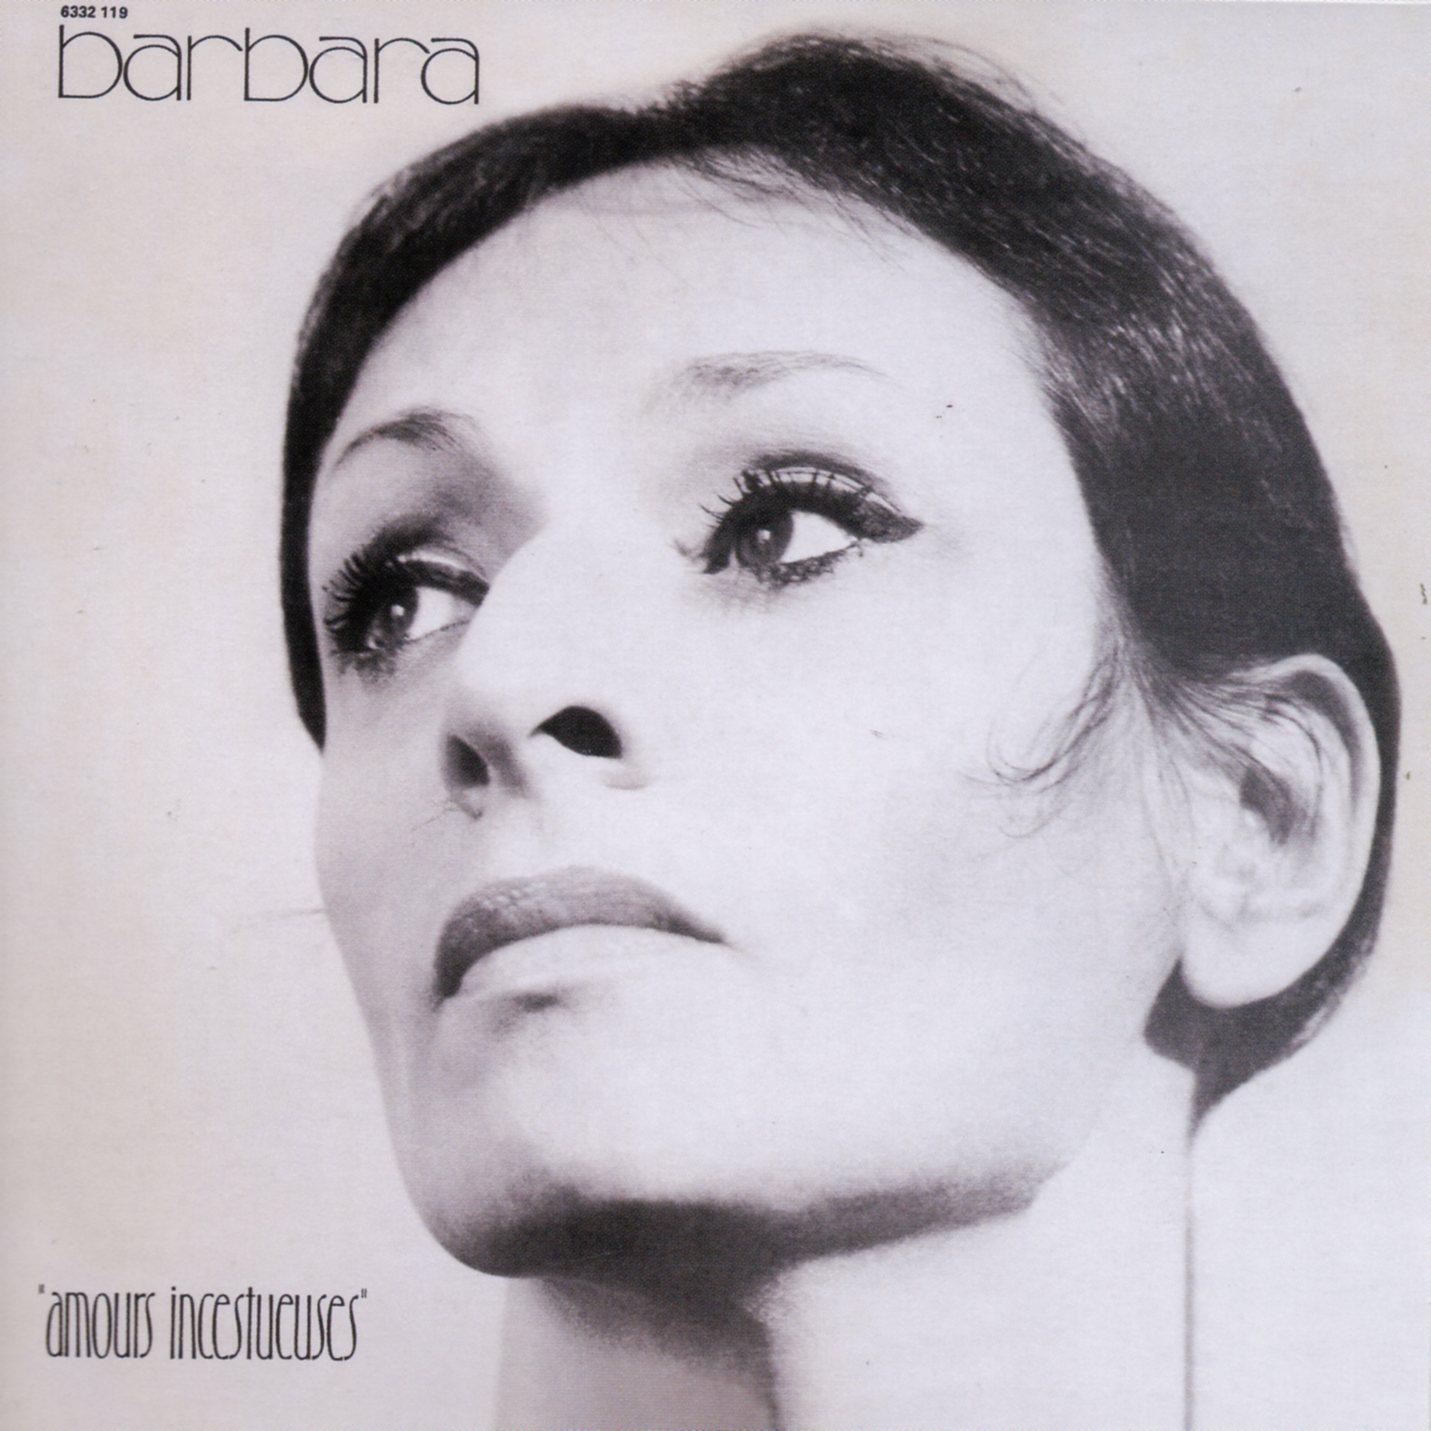 BARBARA - Amours Incestueuses - Mini LP 9-track CARD SLEEVE - CD